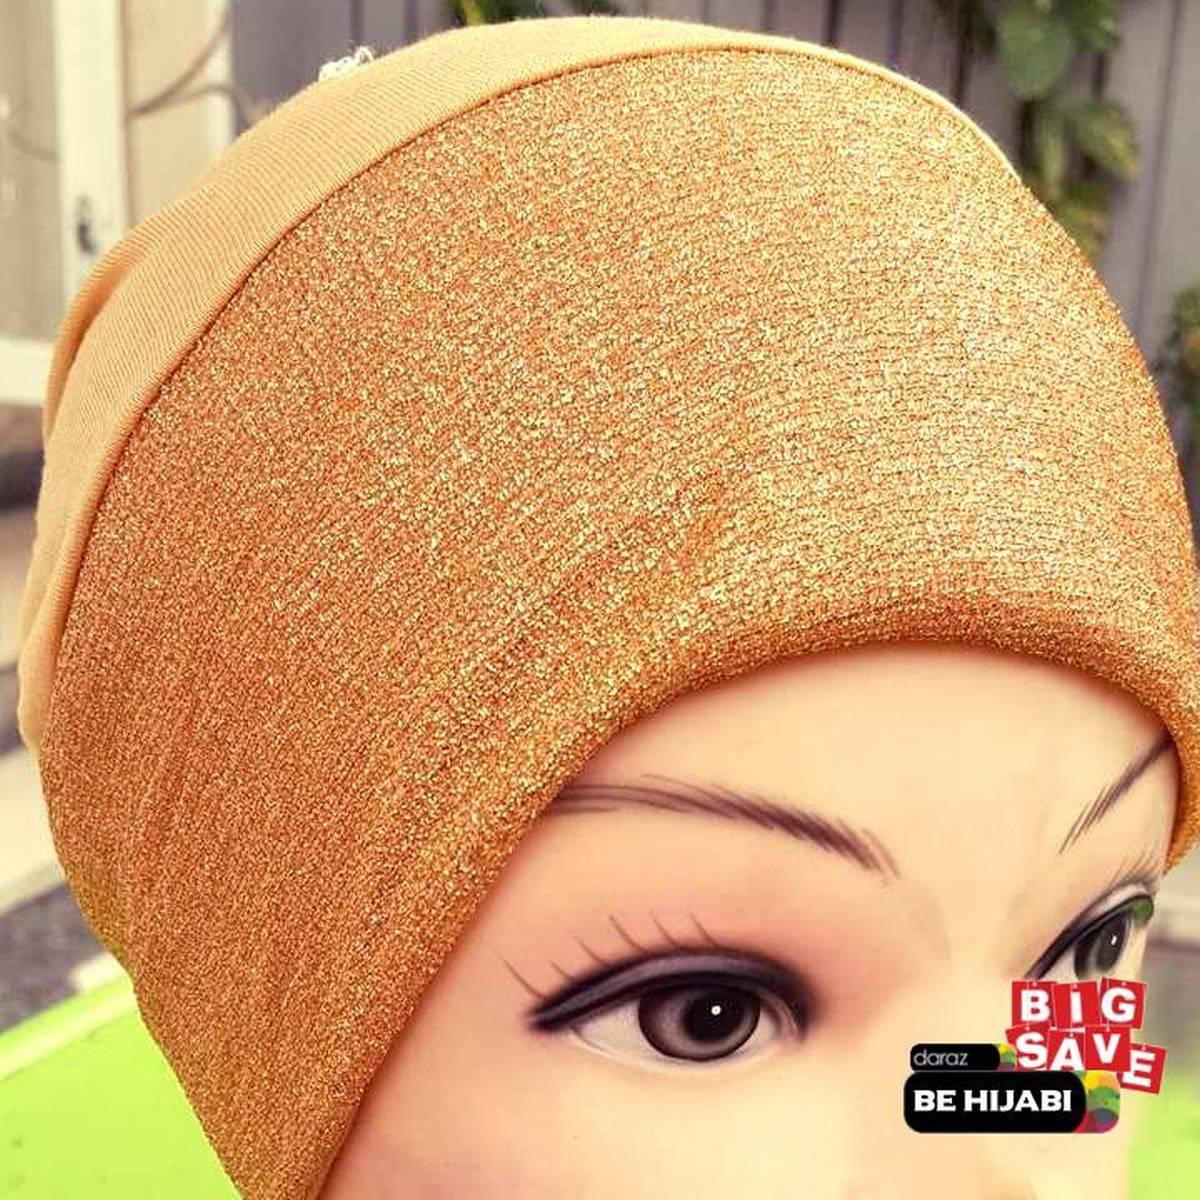 Shimmer glitter golden Muslim Headscarf Inner Hijab Caps Wraps Women Islamic Under Scarf Ninja Scarf Ramadan Stretch Cotton Bonnet Caps